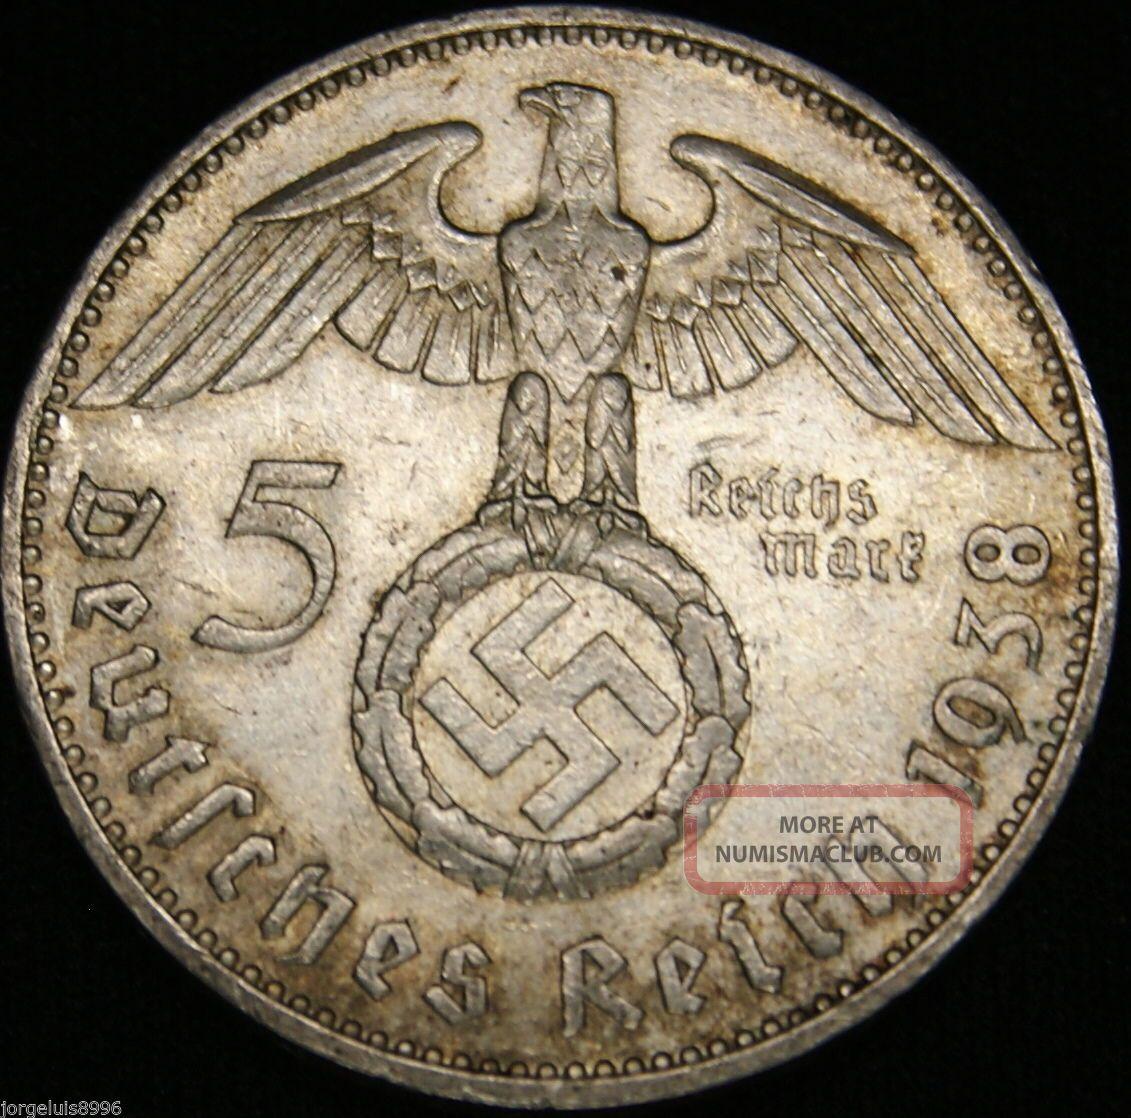 German Nazi Silver Coin 5 Rm 1938 J Big Swastika Germany photo